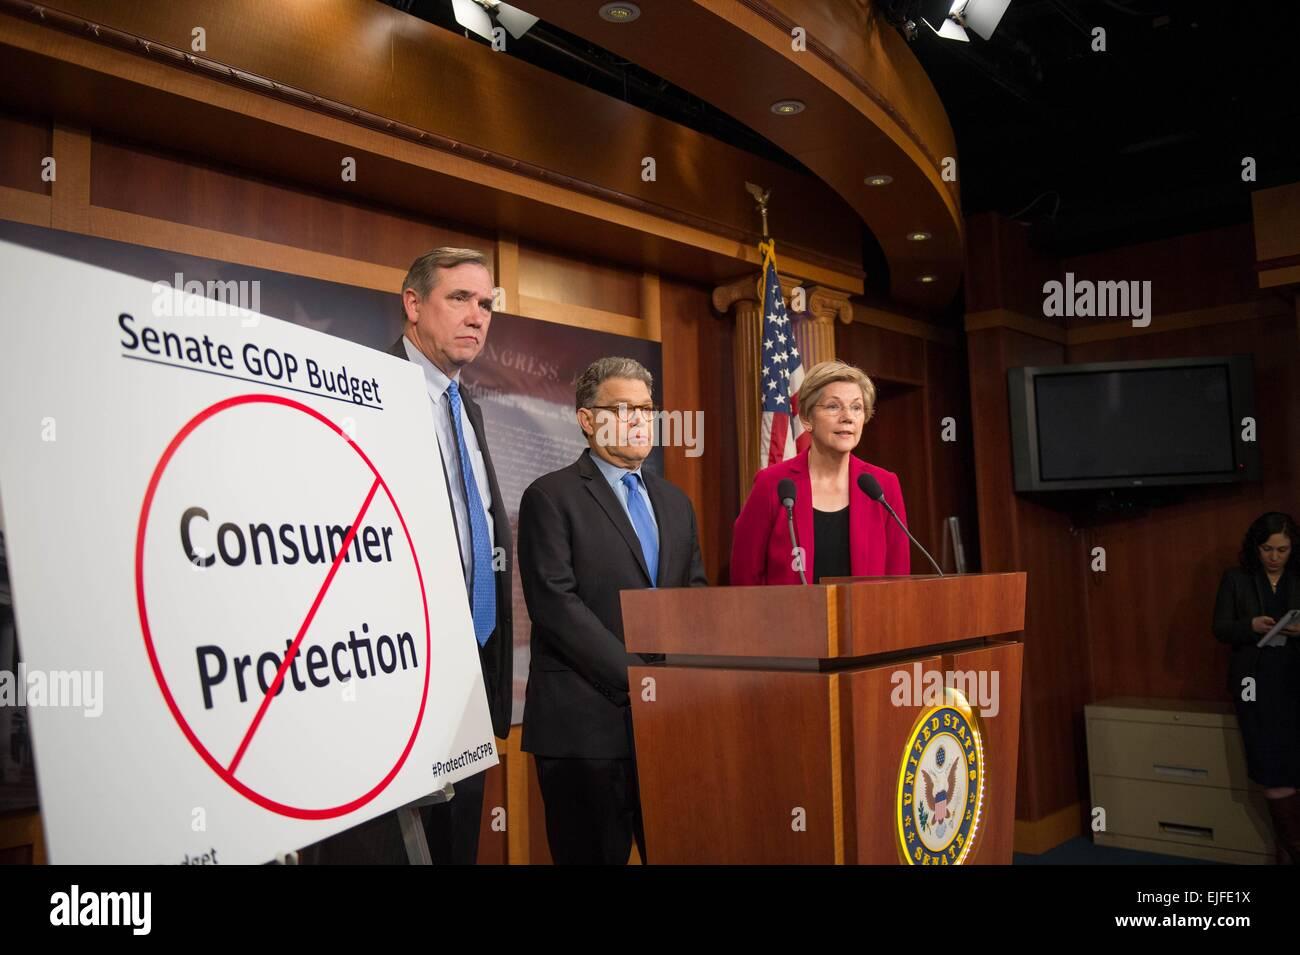 US Senator Elizabeth Warren joined by Senators Al Franken and Jeff Merkley comments on the Senate Republican budget - Stock Image